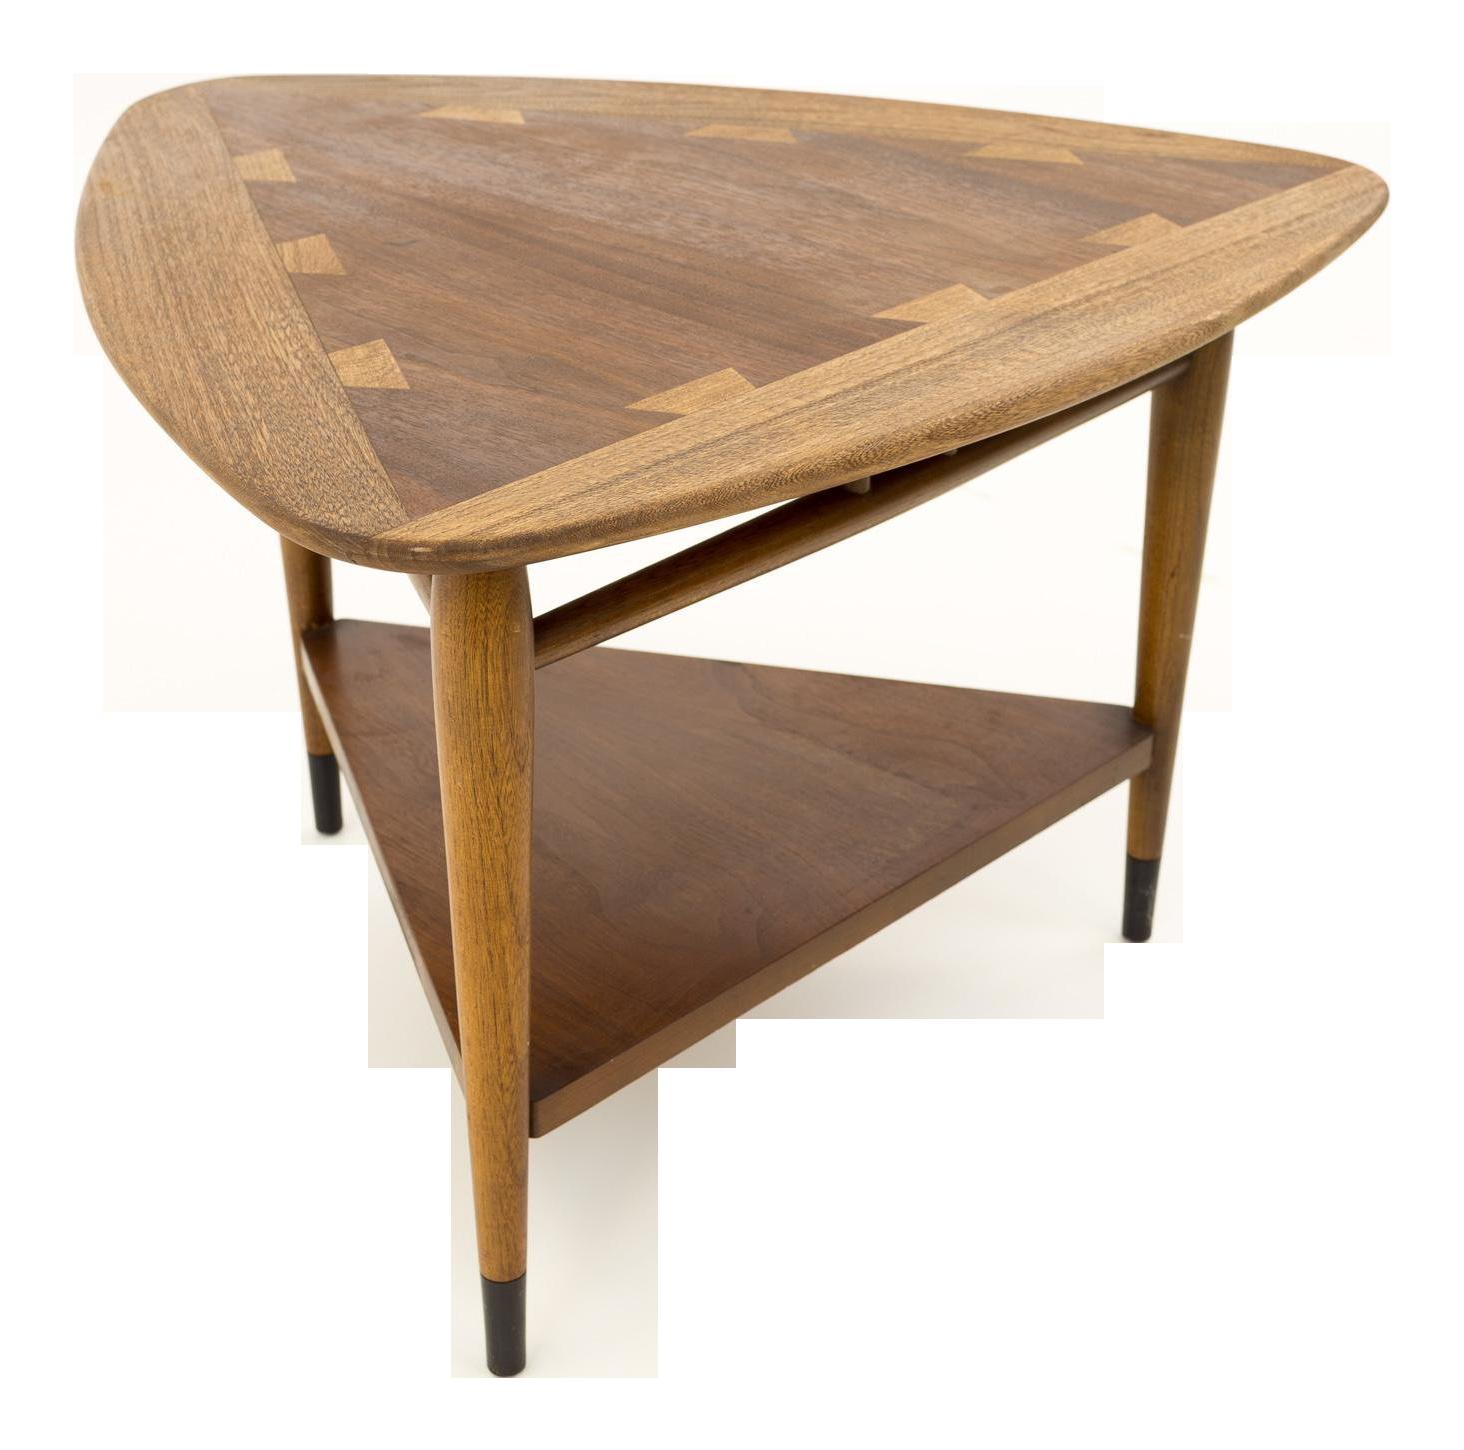 Belham Living Campbell Mid Century Modern Lift Top Marble Coffee Table Mid Century Modern Coffee Table Coffee Table Coffee Table Design [ 1600 x 1600 Pixel ]